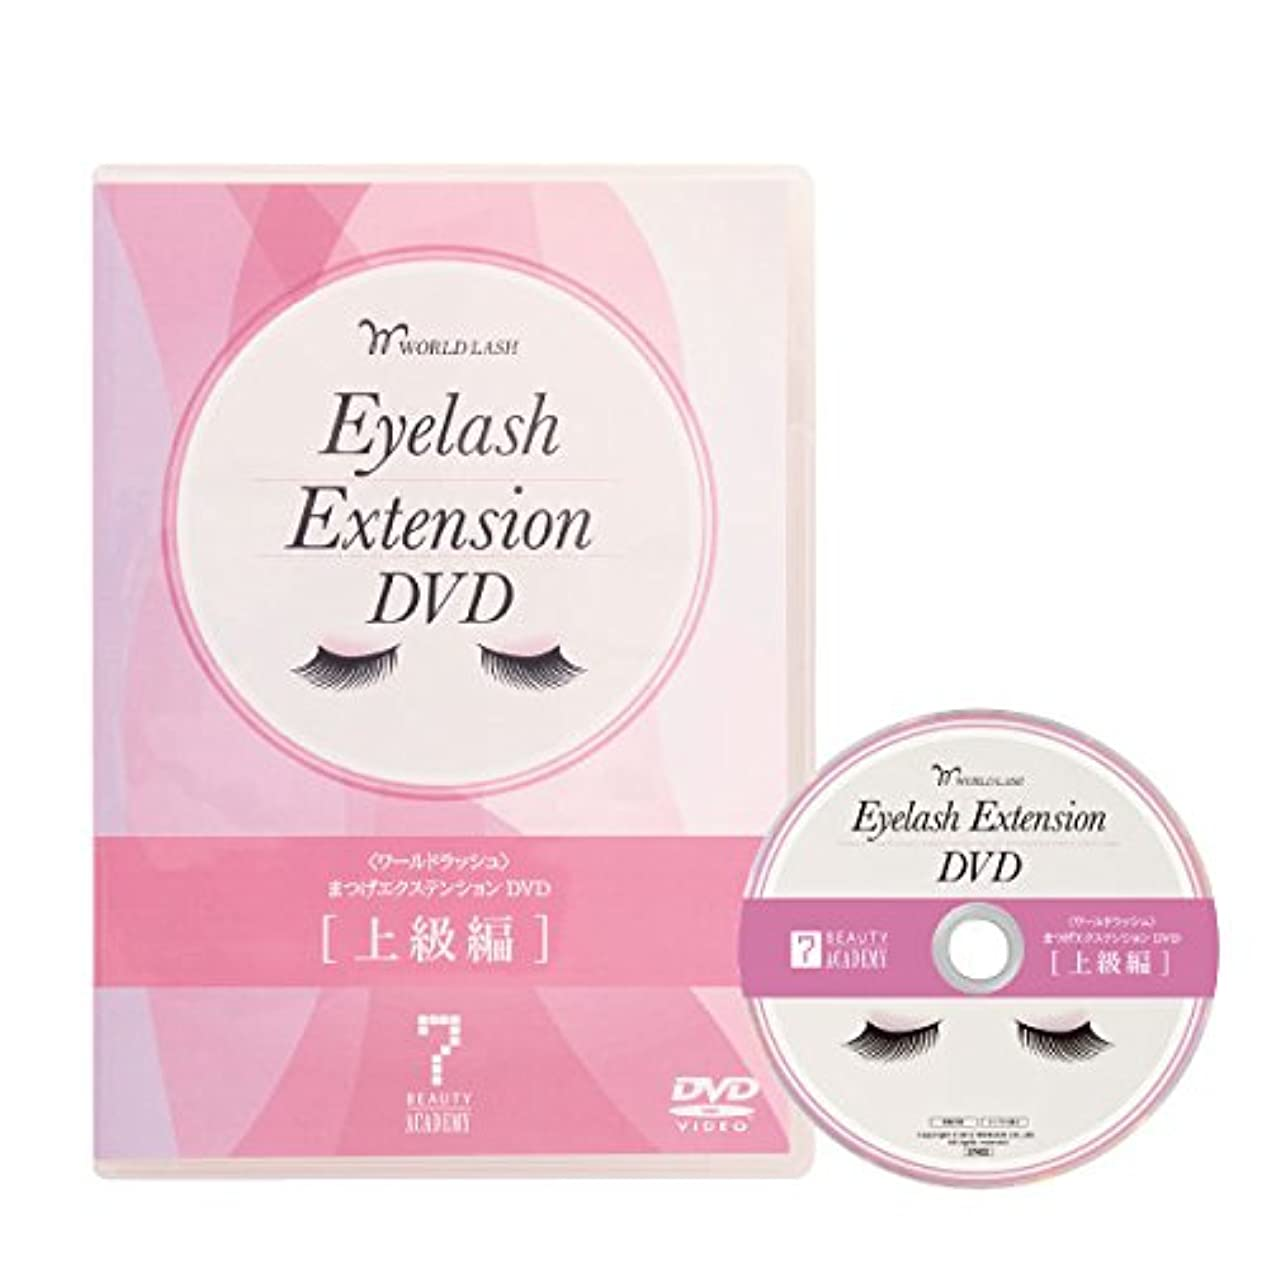 < WORLD LASH > まつげエクステンション DVD (上級編) [ 教材 テキスト DVD まつげエクステ まつ毛エクステ まつエク マツエク サロン用 ]